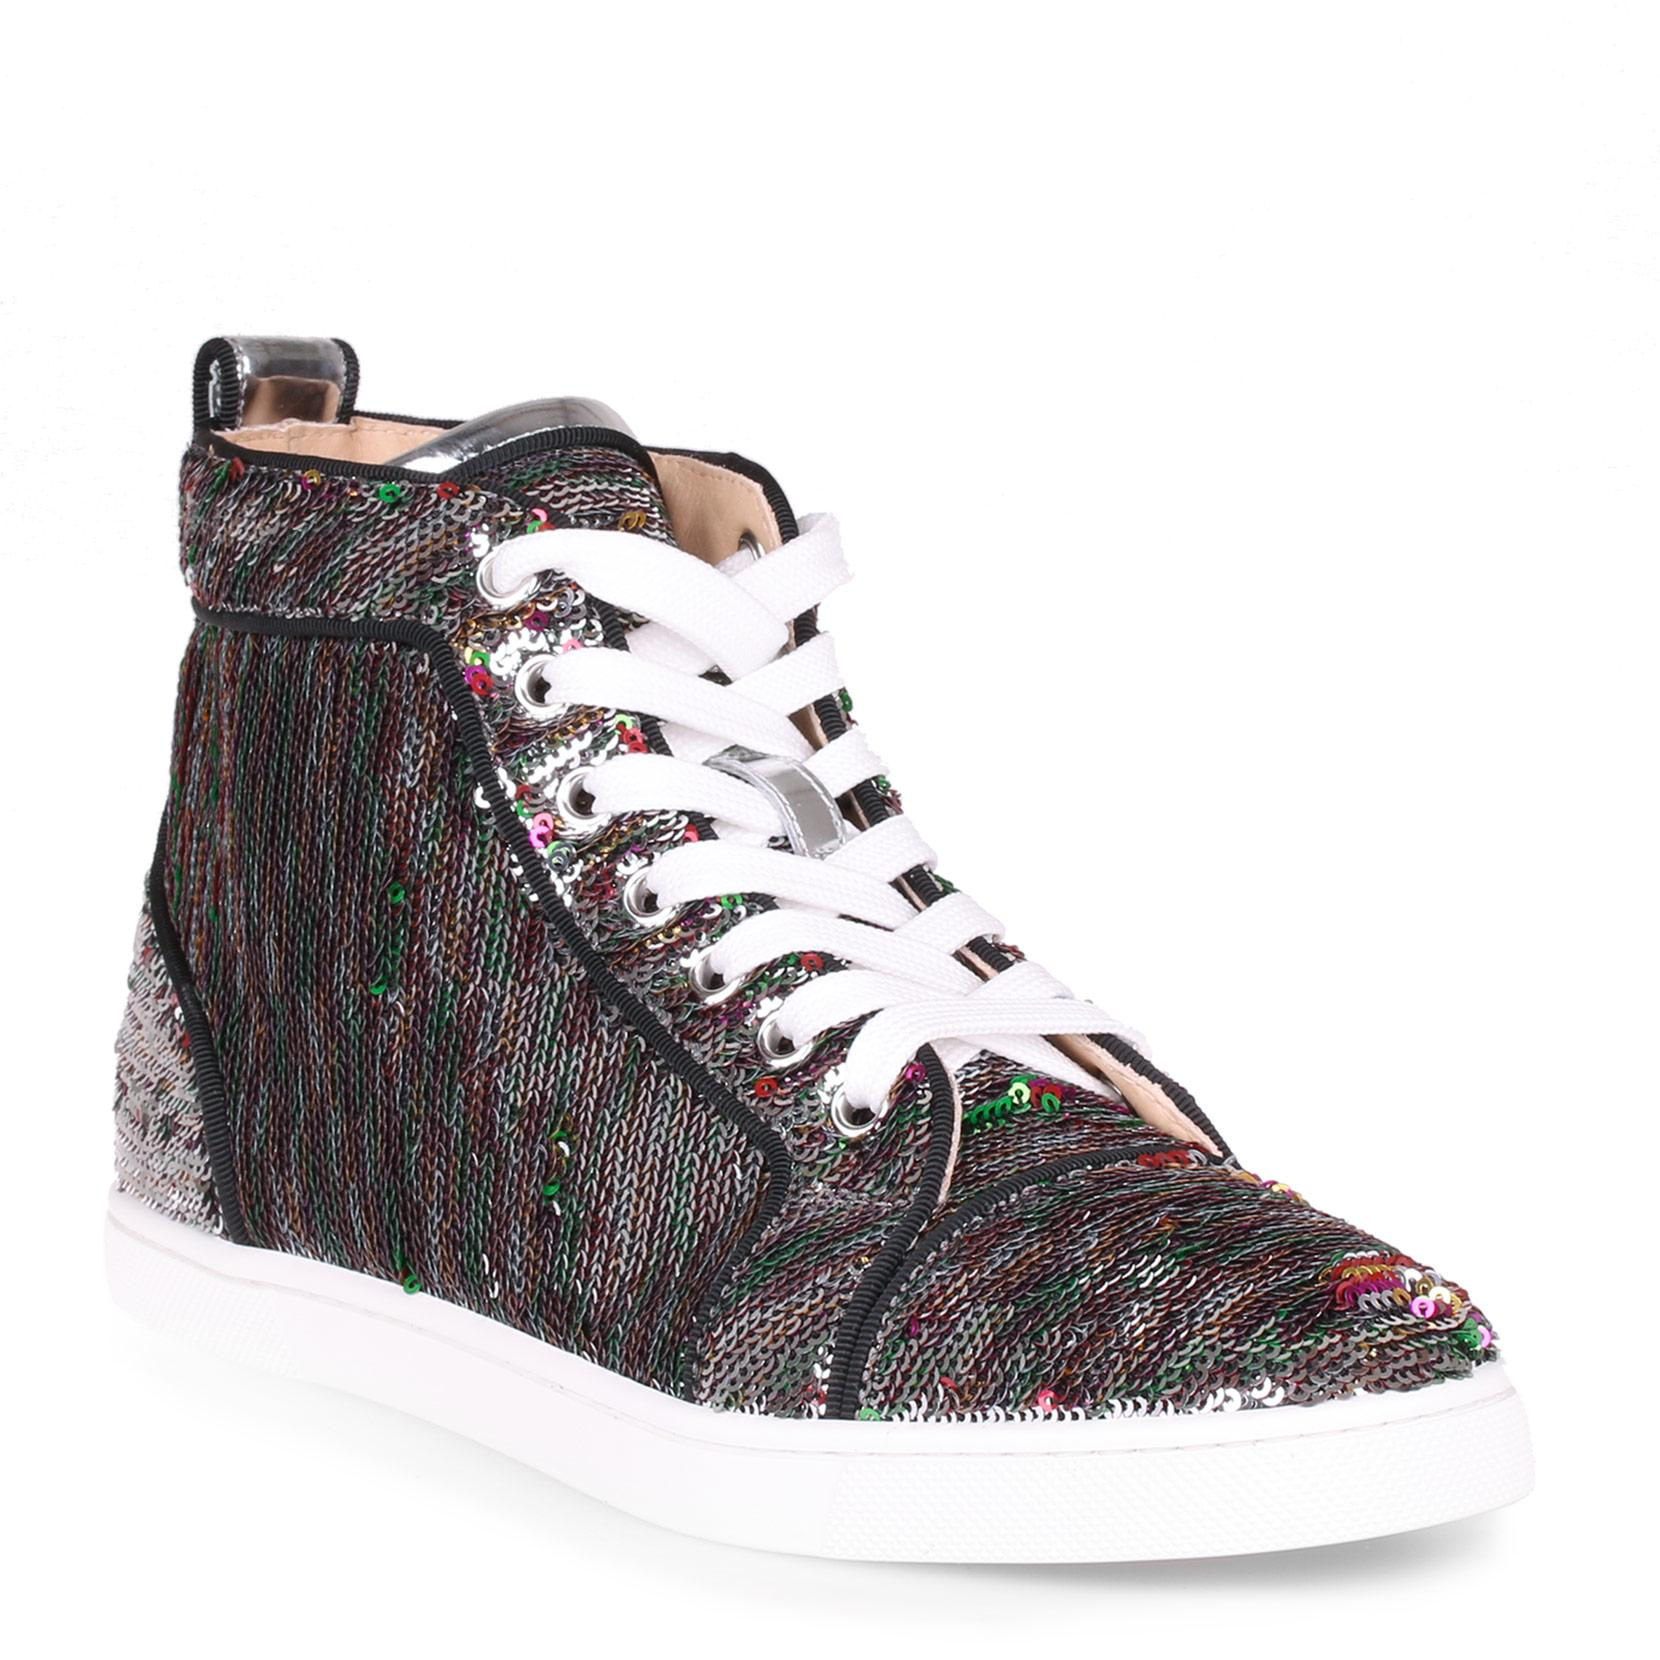 7cbcbb6e6293 Christian Louboutin Bip Bip Silver Sequin Sneaker In Grey